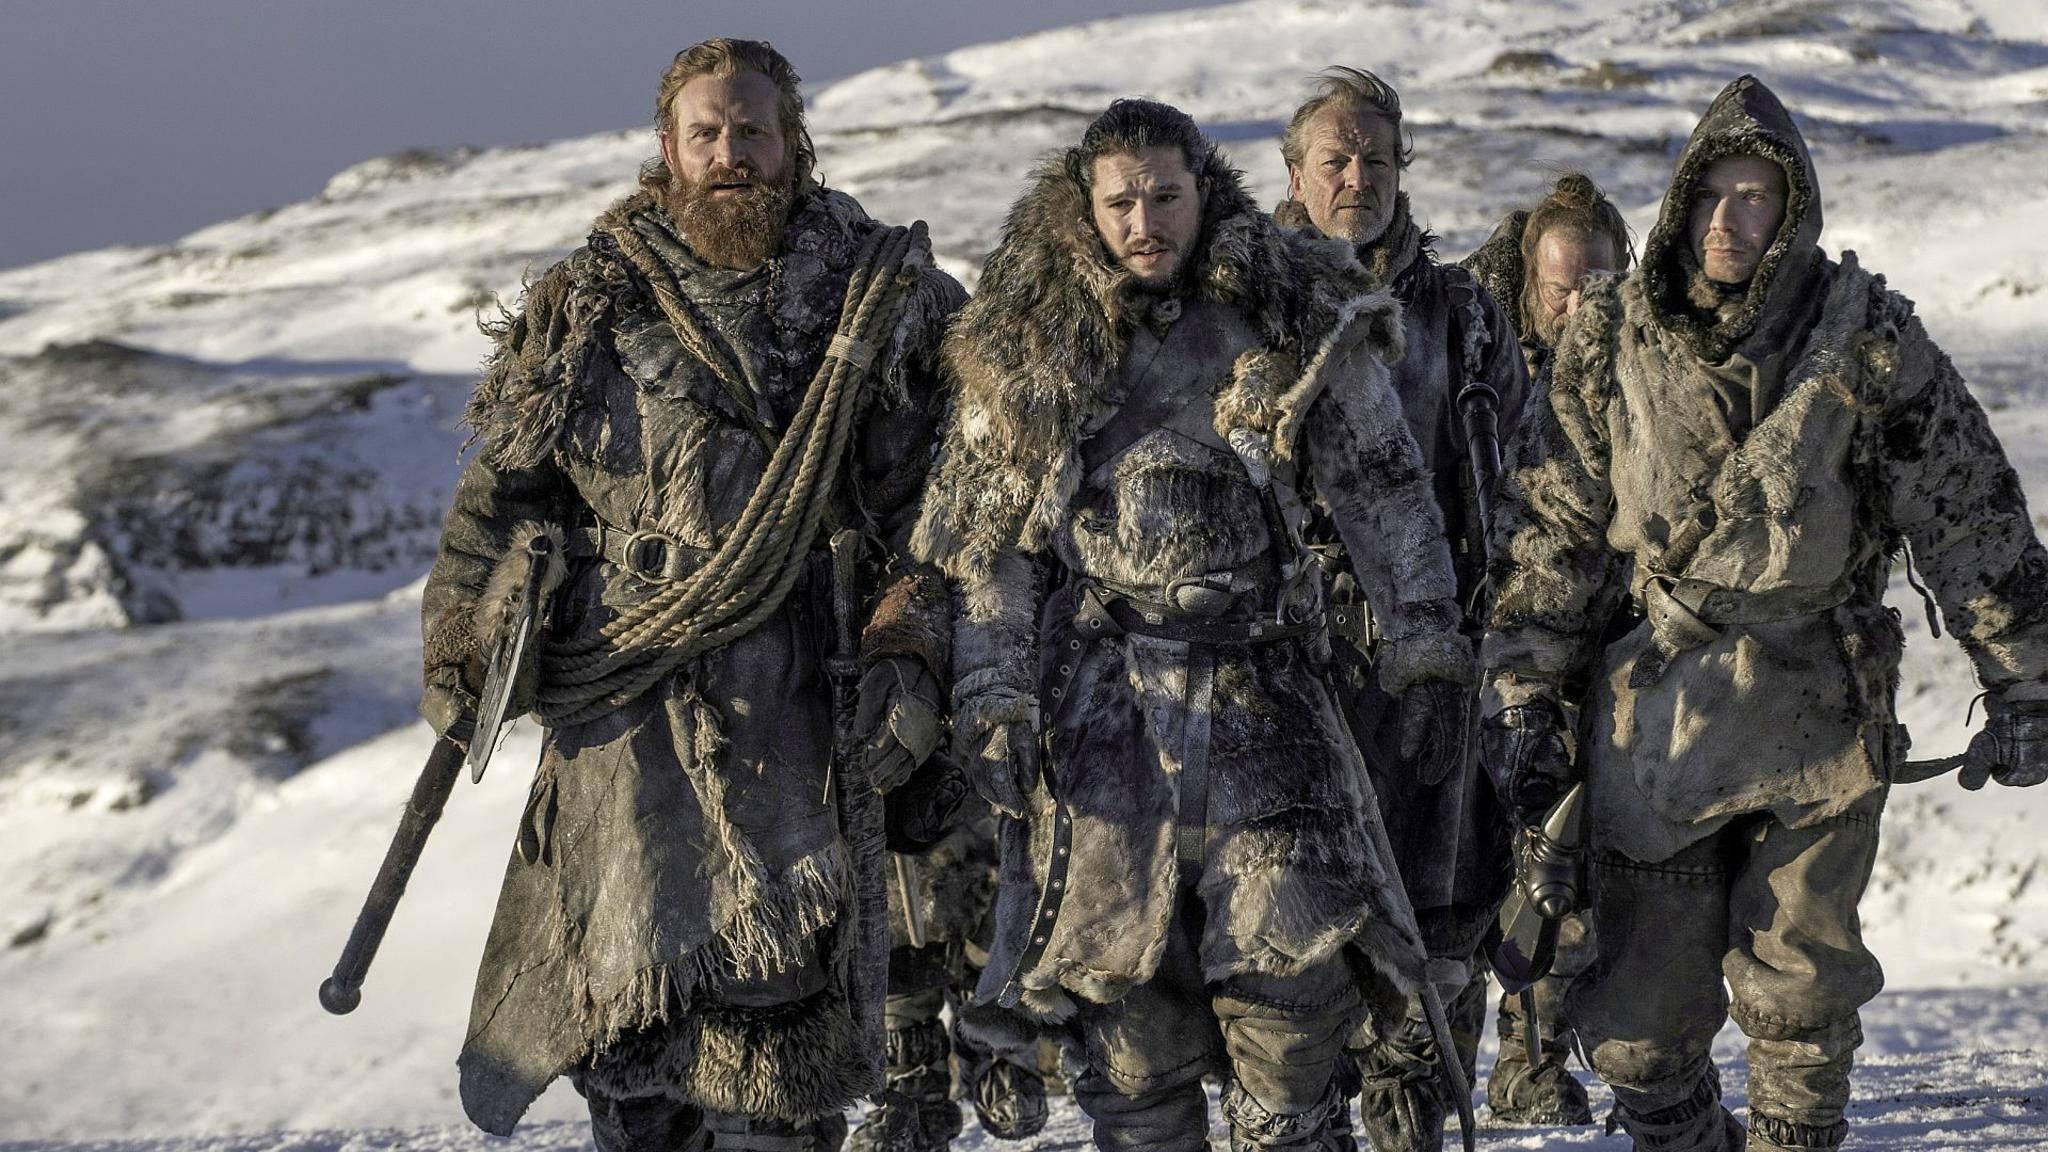 game-of-thrones-staffel-7-episode-6-jon-snow-gang